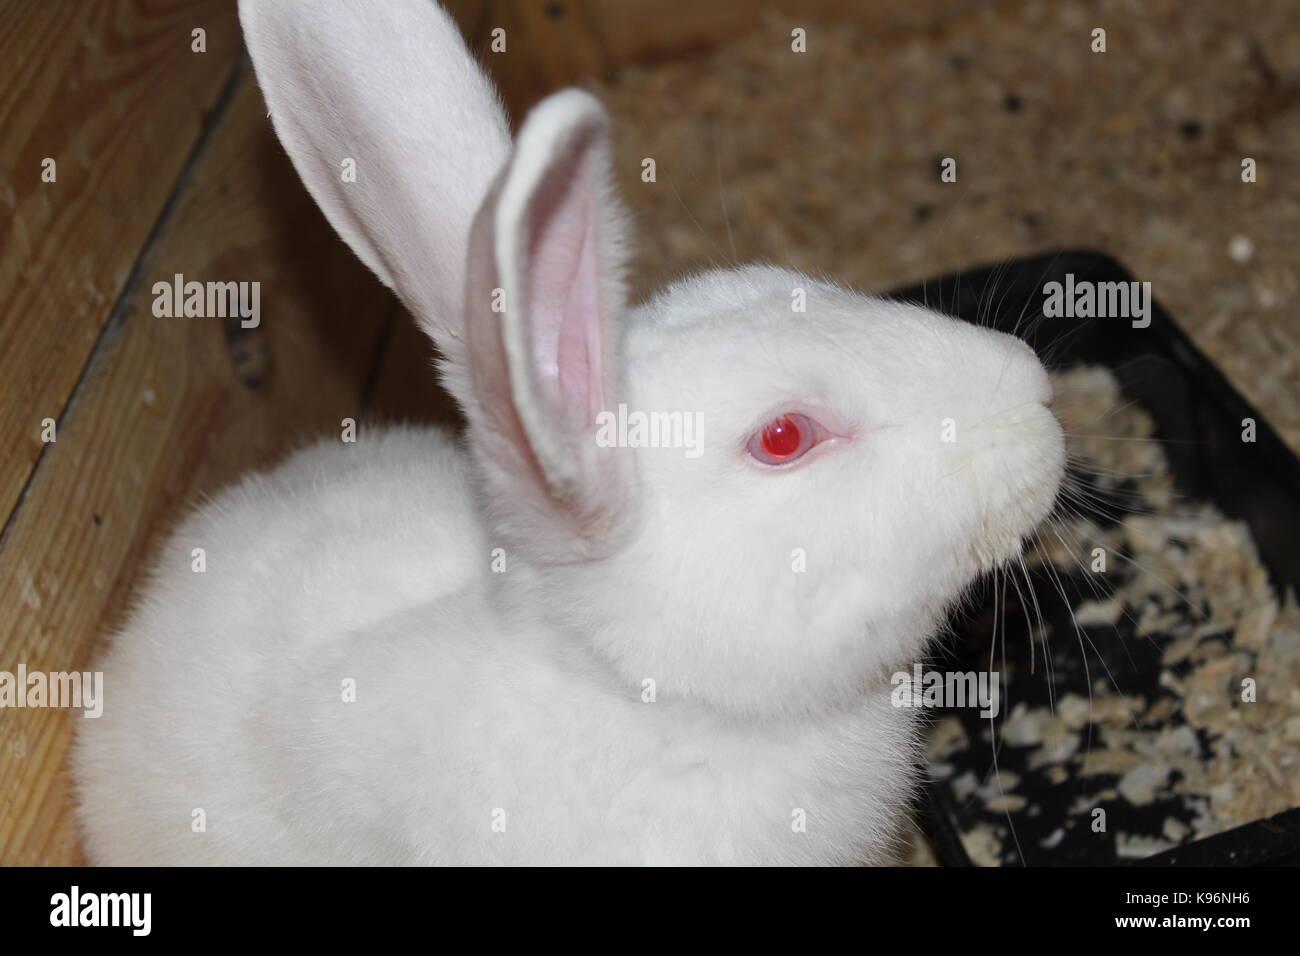 Animals - Stock Image